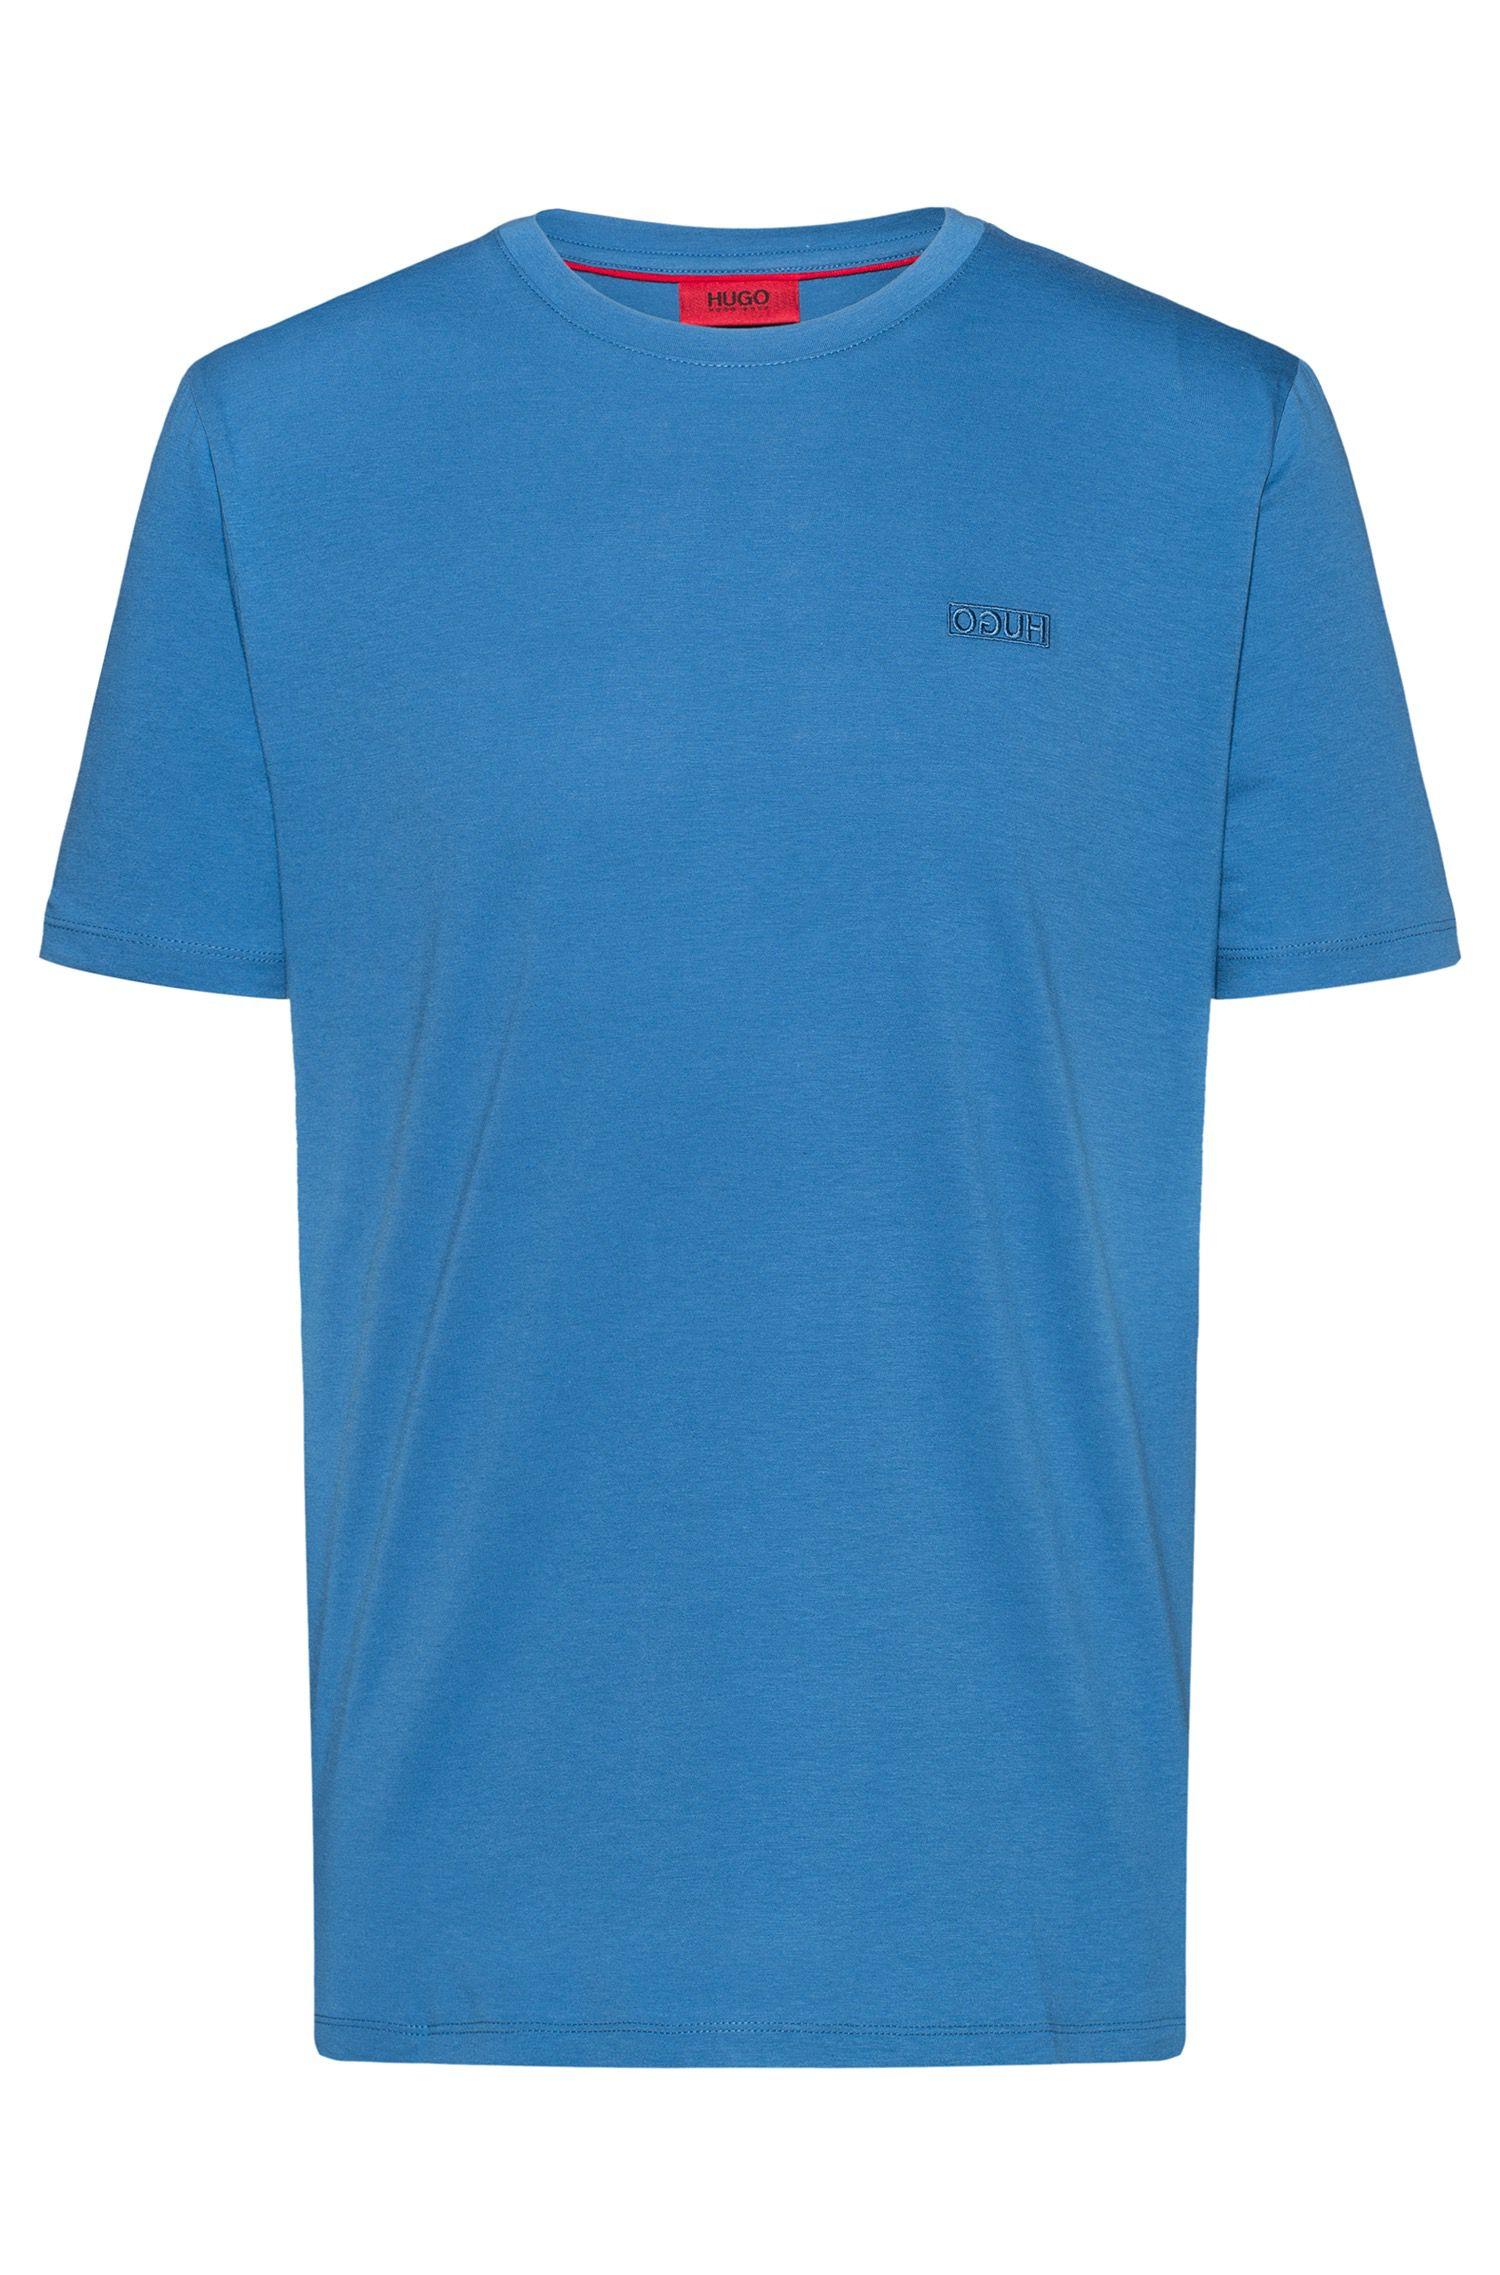 T-shirt con logo reversed in jersey di cotone, Blu